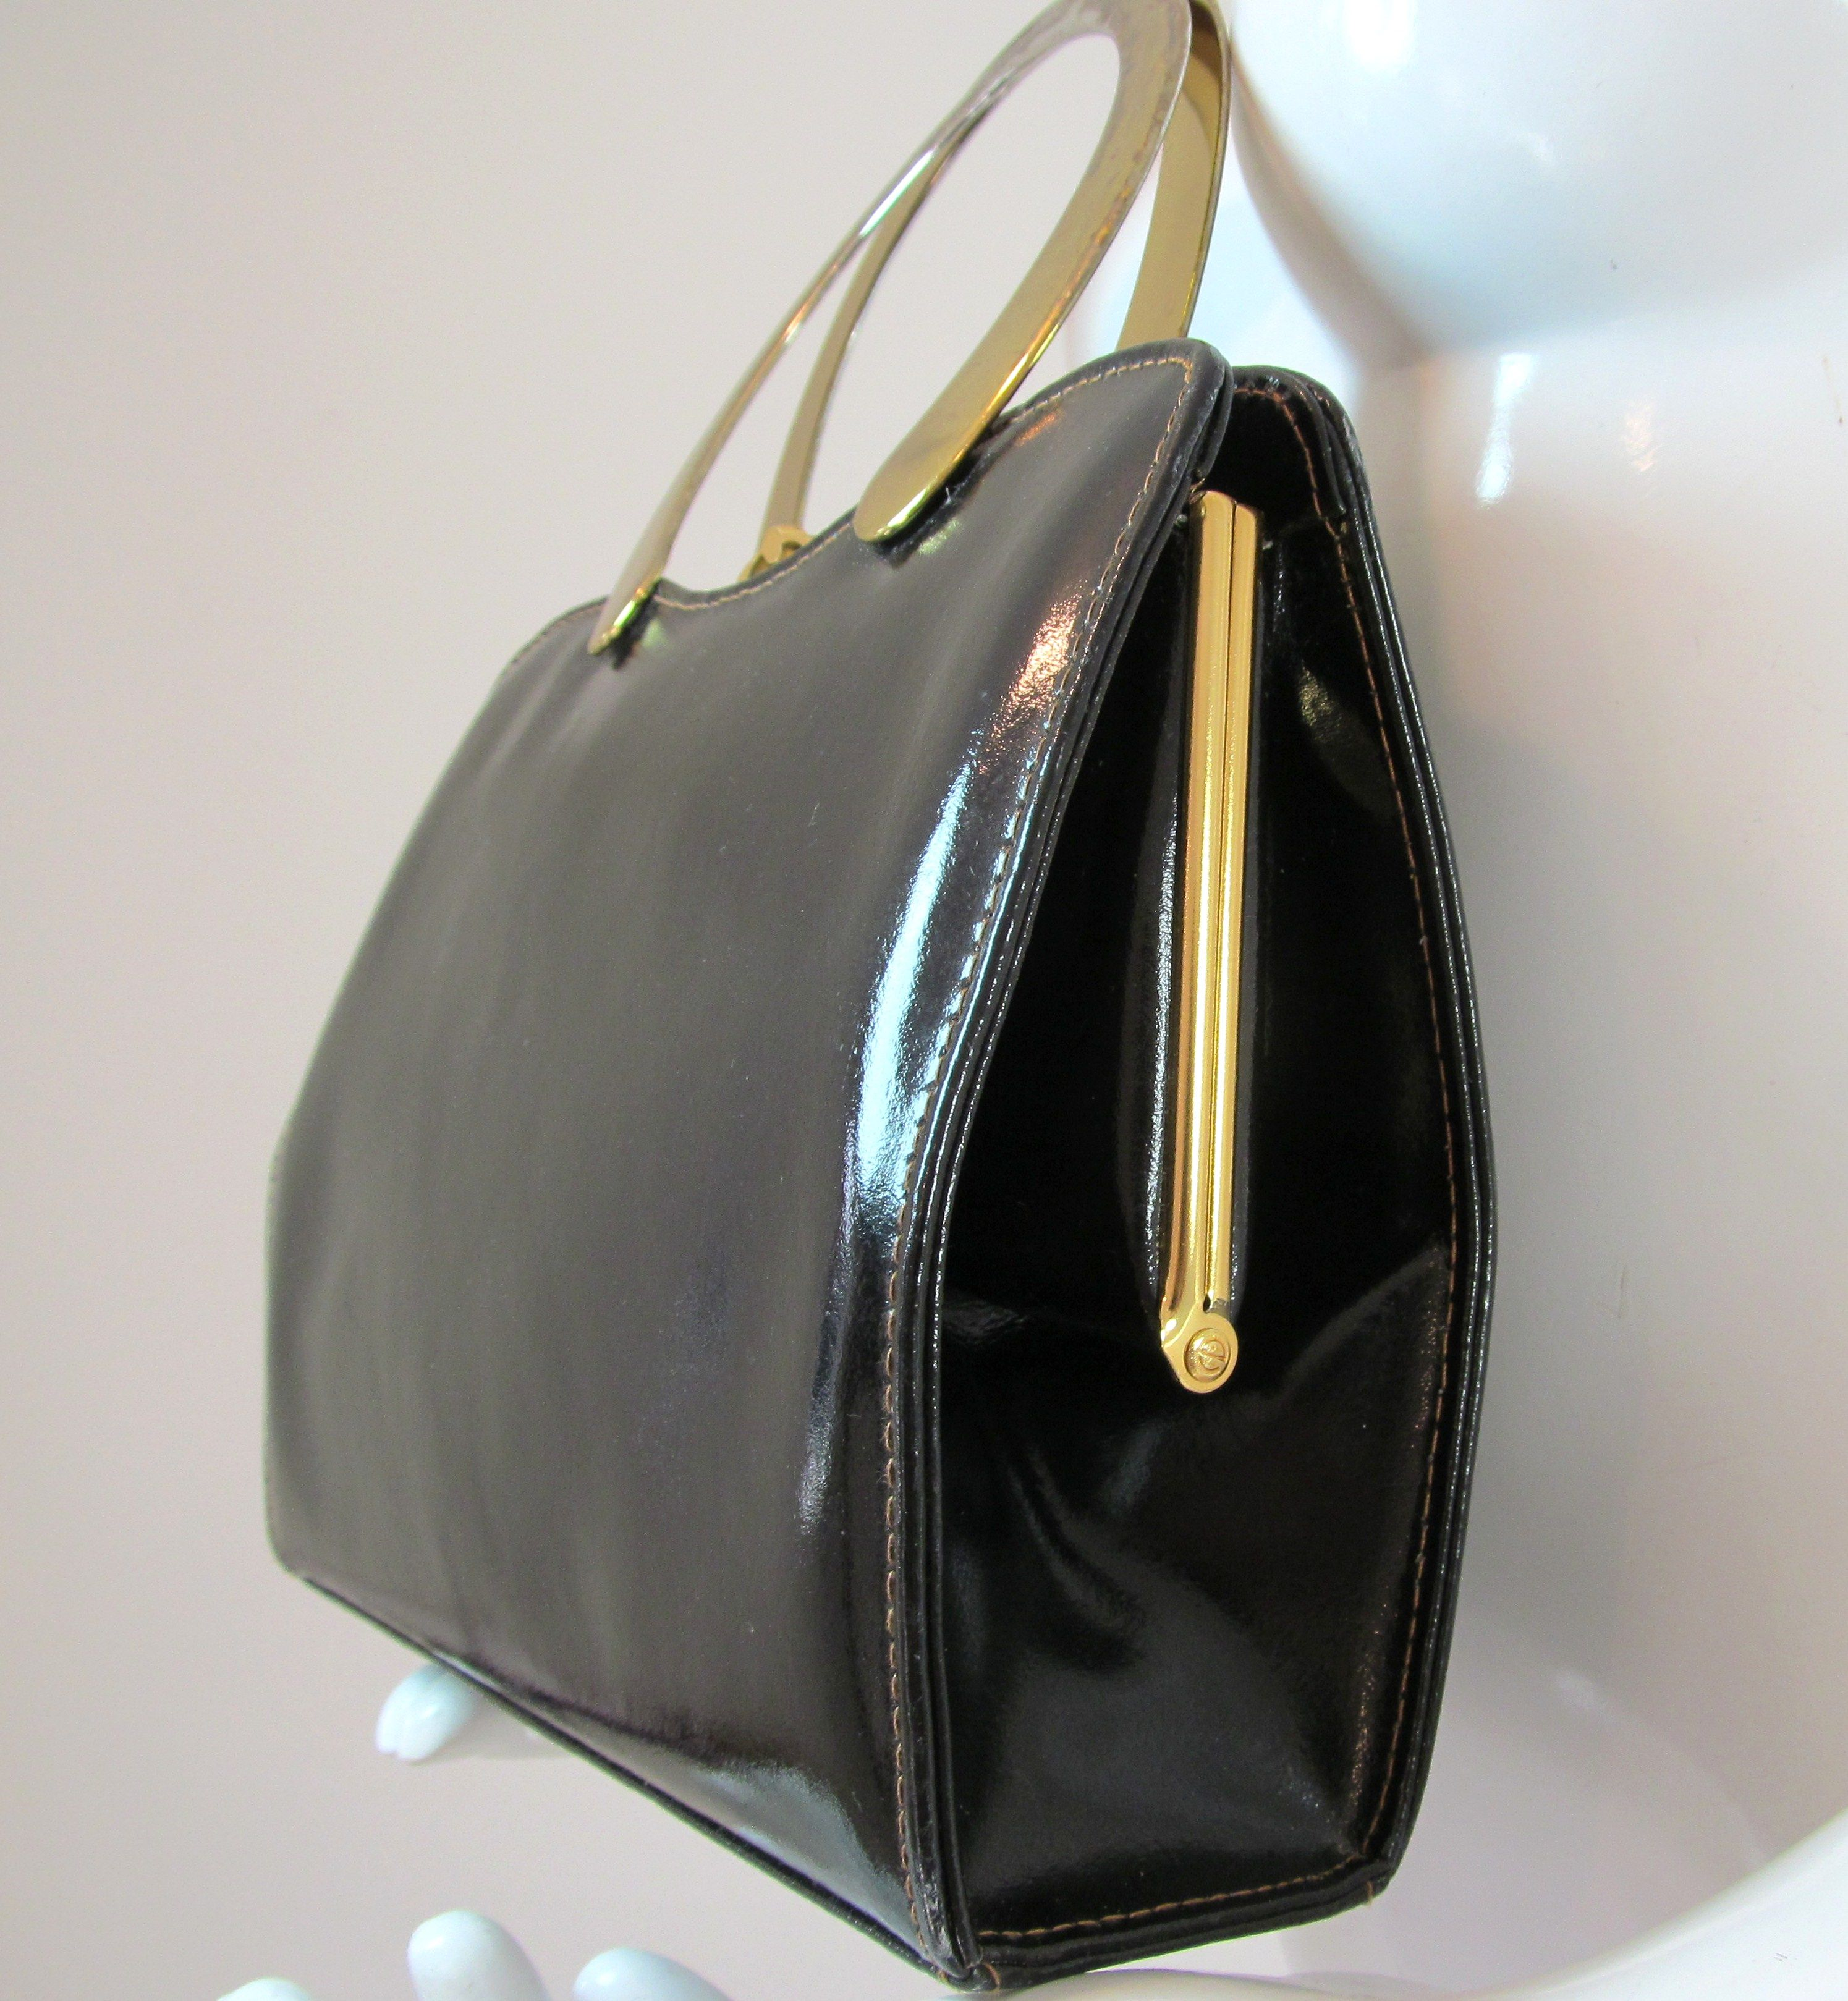 Vintage Ackery London Black Shiny Leather 40 50 S Clip Top Handbag Purse R10490